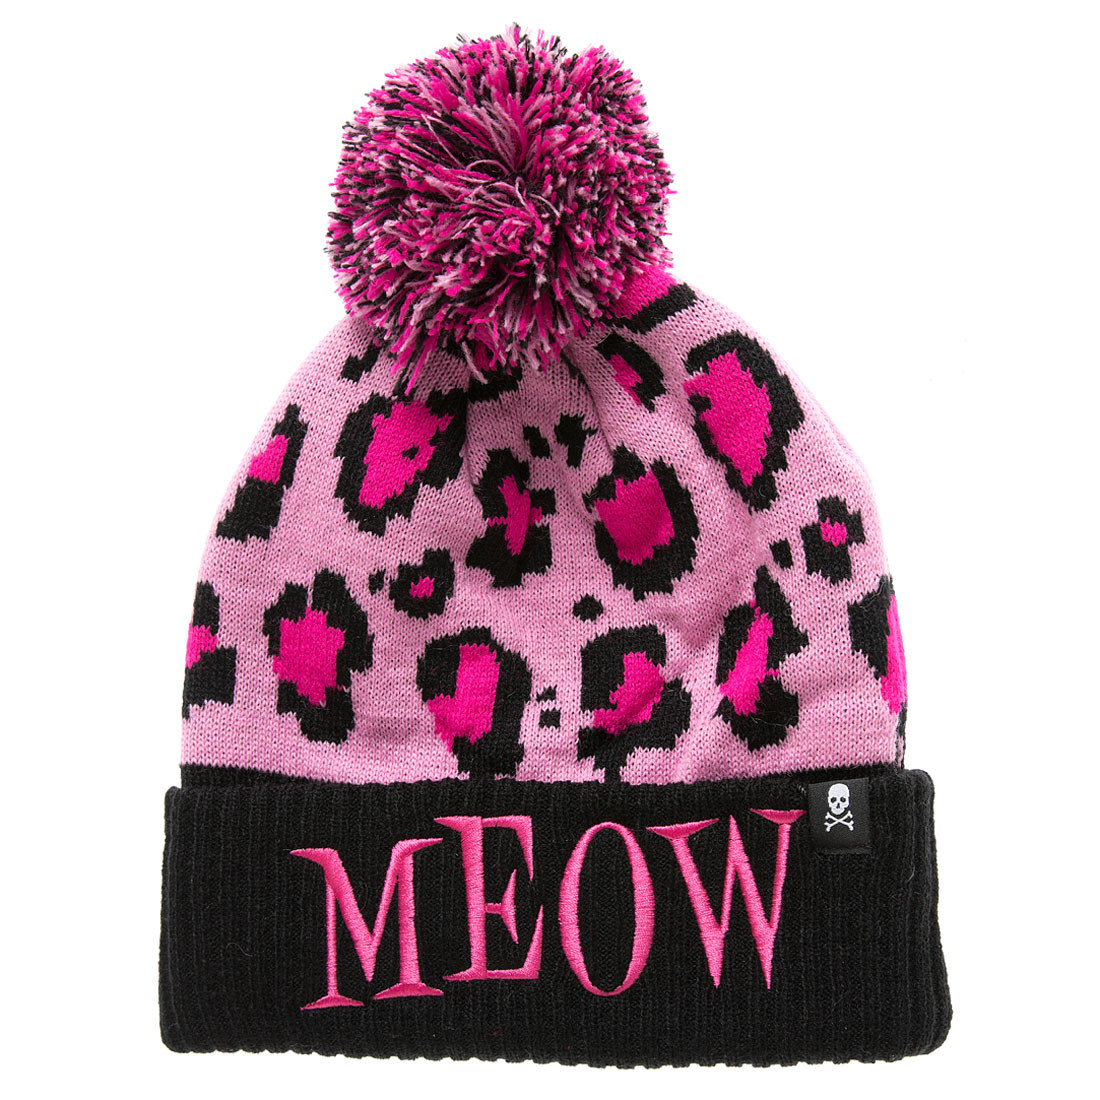 SOU021-Meow-Pink-Leopard-Be  84453.1542734549.1280.1280.jpg c 2 bc679223152